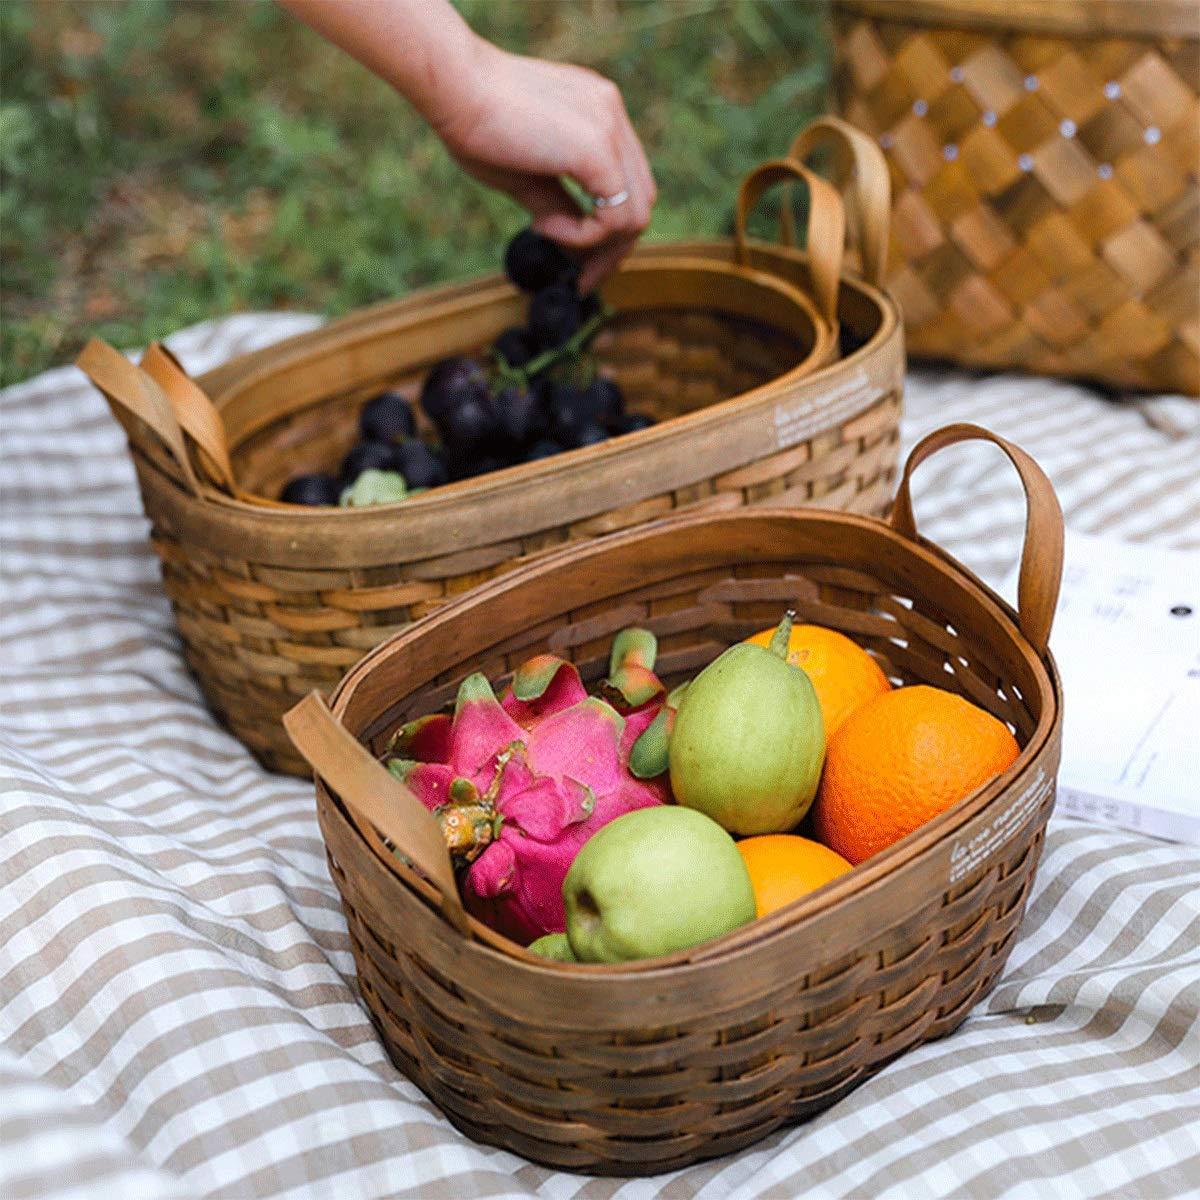 Tongboshi Bread Basket, Hand-Woven Storage Basket (with Handle), Picnic Fruit Bread Basket, Storage Basket, Oval Fruit Basket Three-Piece, Latest Models (Color : 3-Piece Set) by Tongboshi (Image #6)